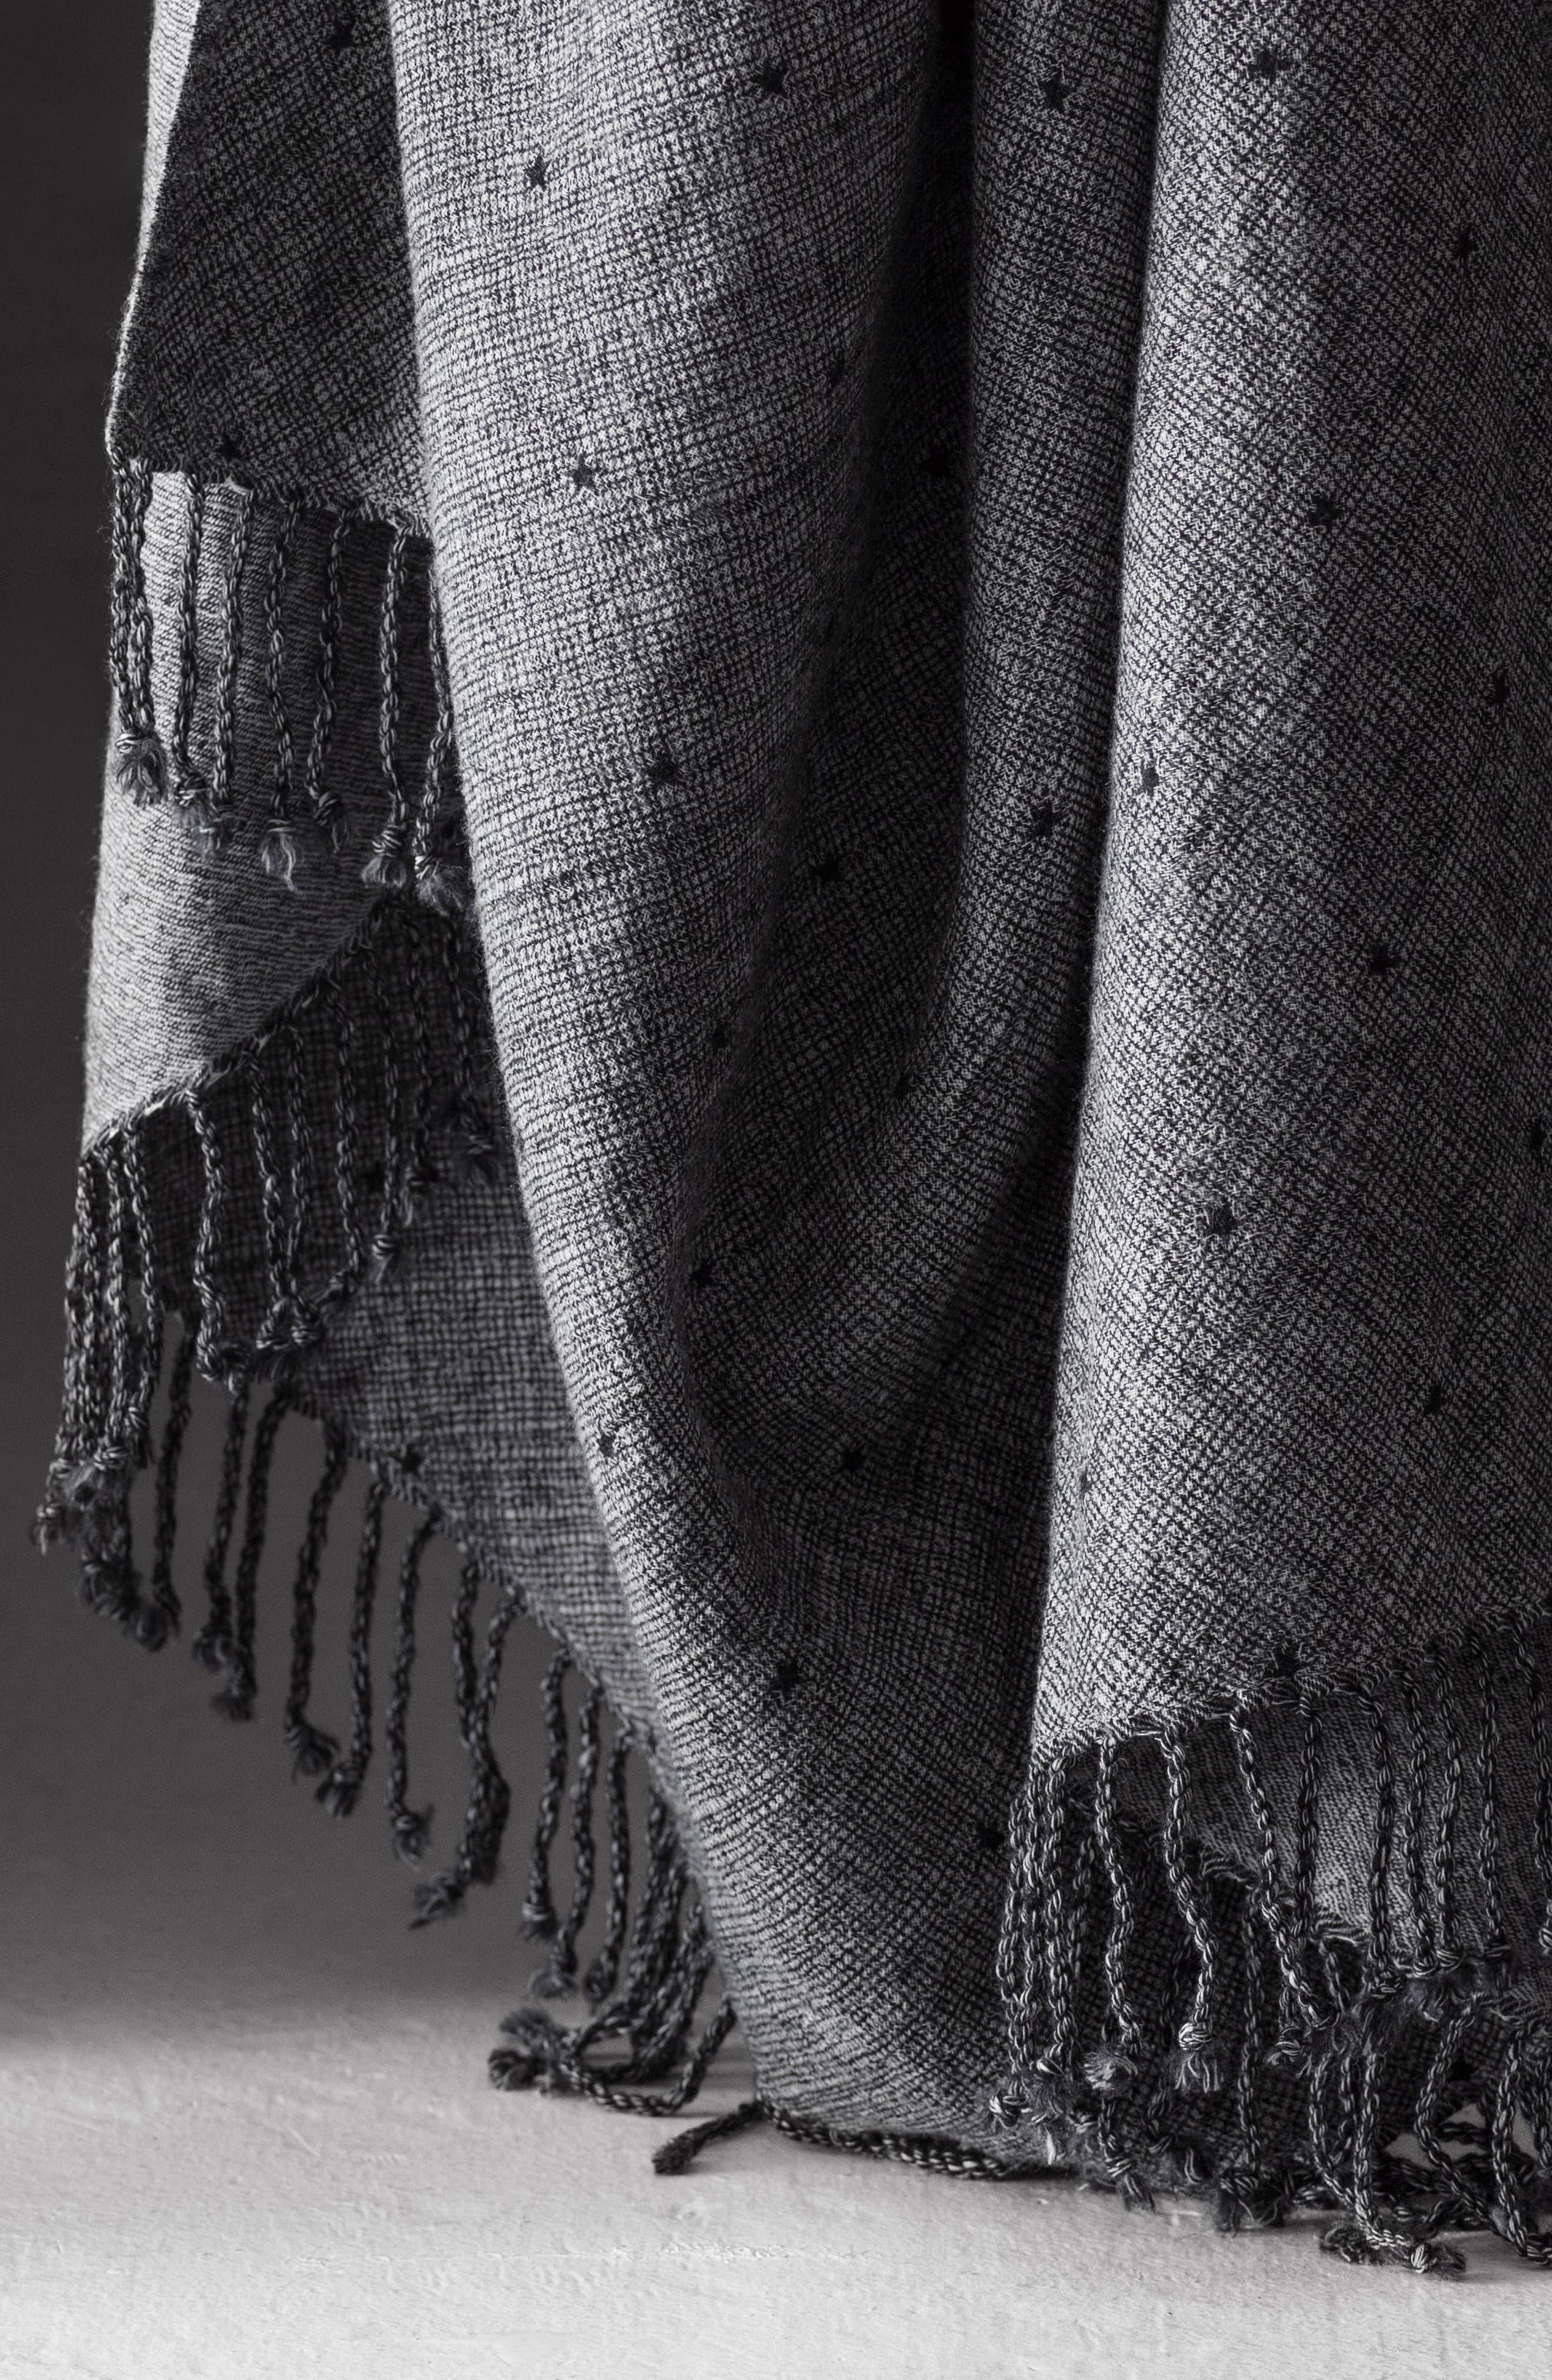 Blackstar Double Face Merino Wool Throw,                             Alternate thumbnail 4, color,                             BLACKSTAR